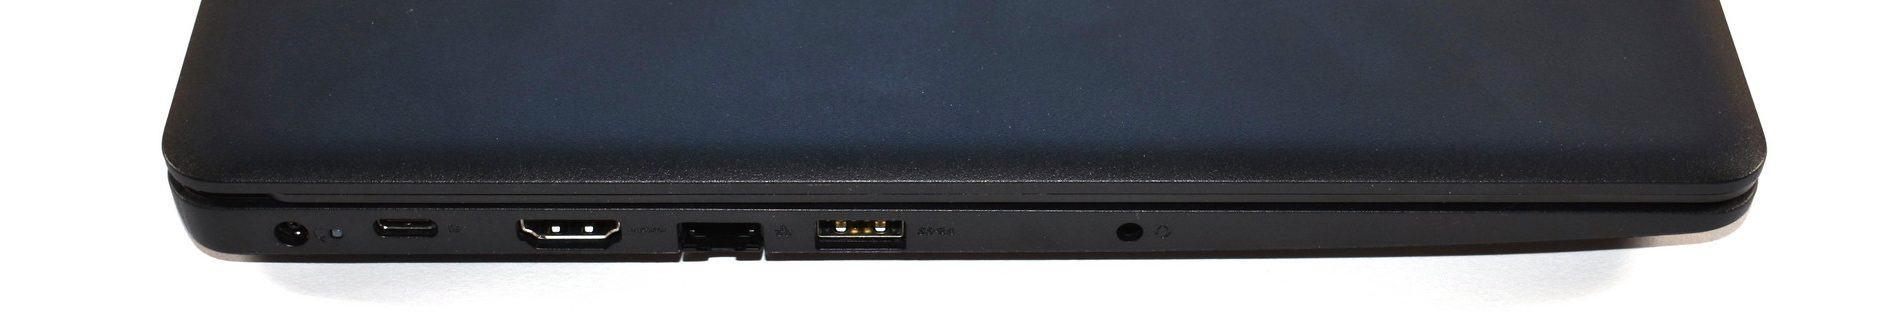 đánh giá laptop dell latitude 3490